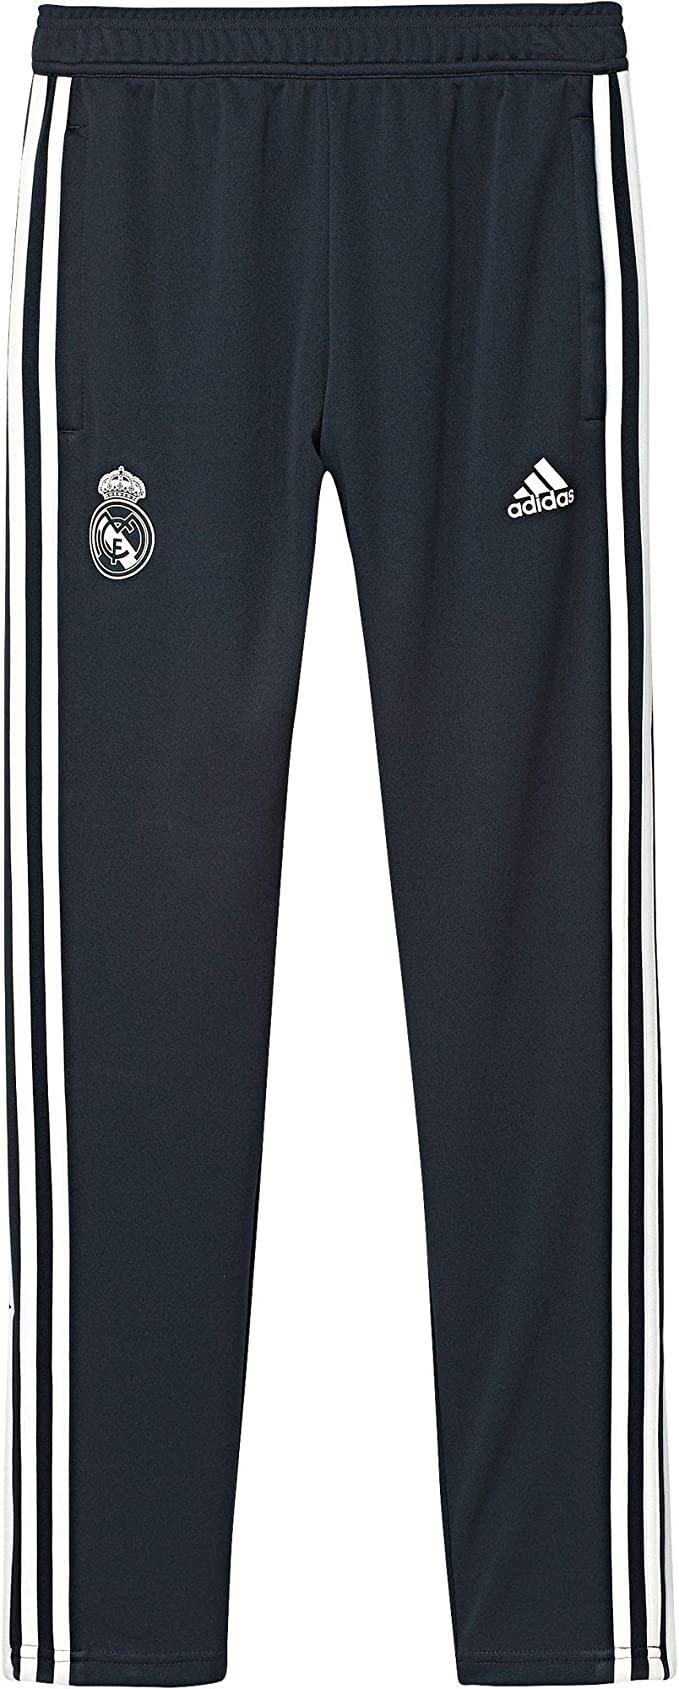 Apellido Bienvenido Intentar  Amazon.com : adidas 2018-2019 Real Madrid Training Pants (Dark Grey) - Kids  : Clothing